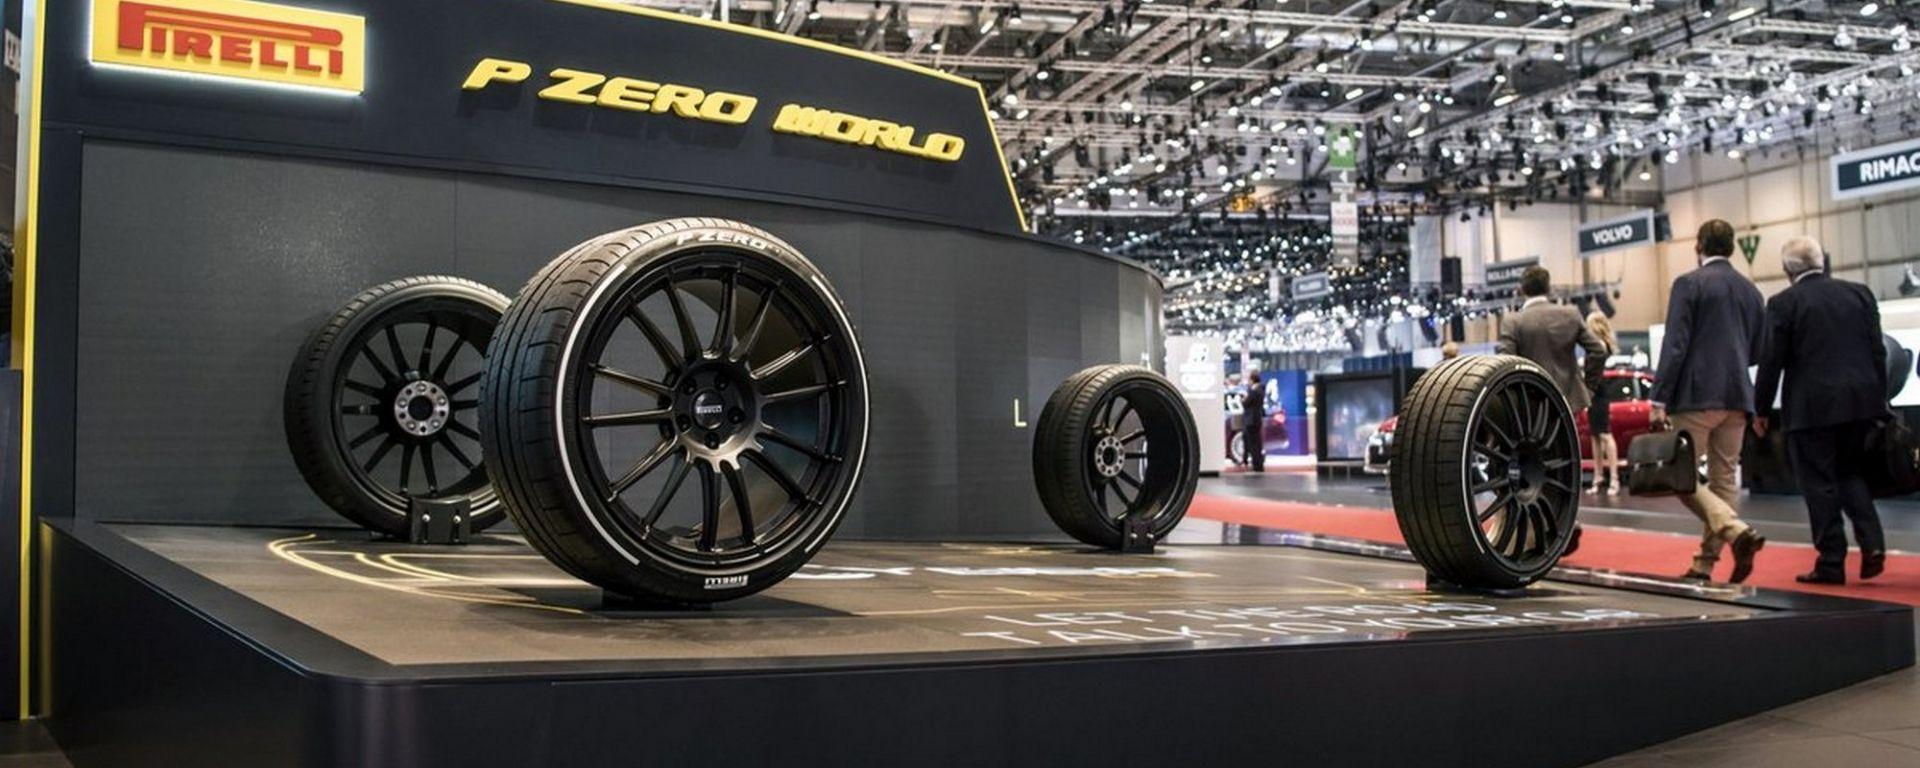 Pirelli Cyber Car a Ginevra 2018